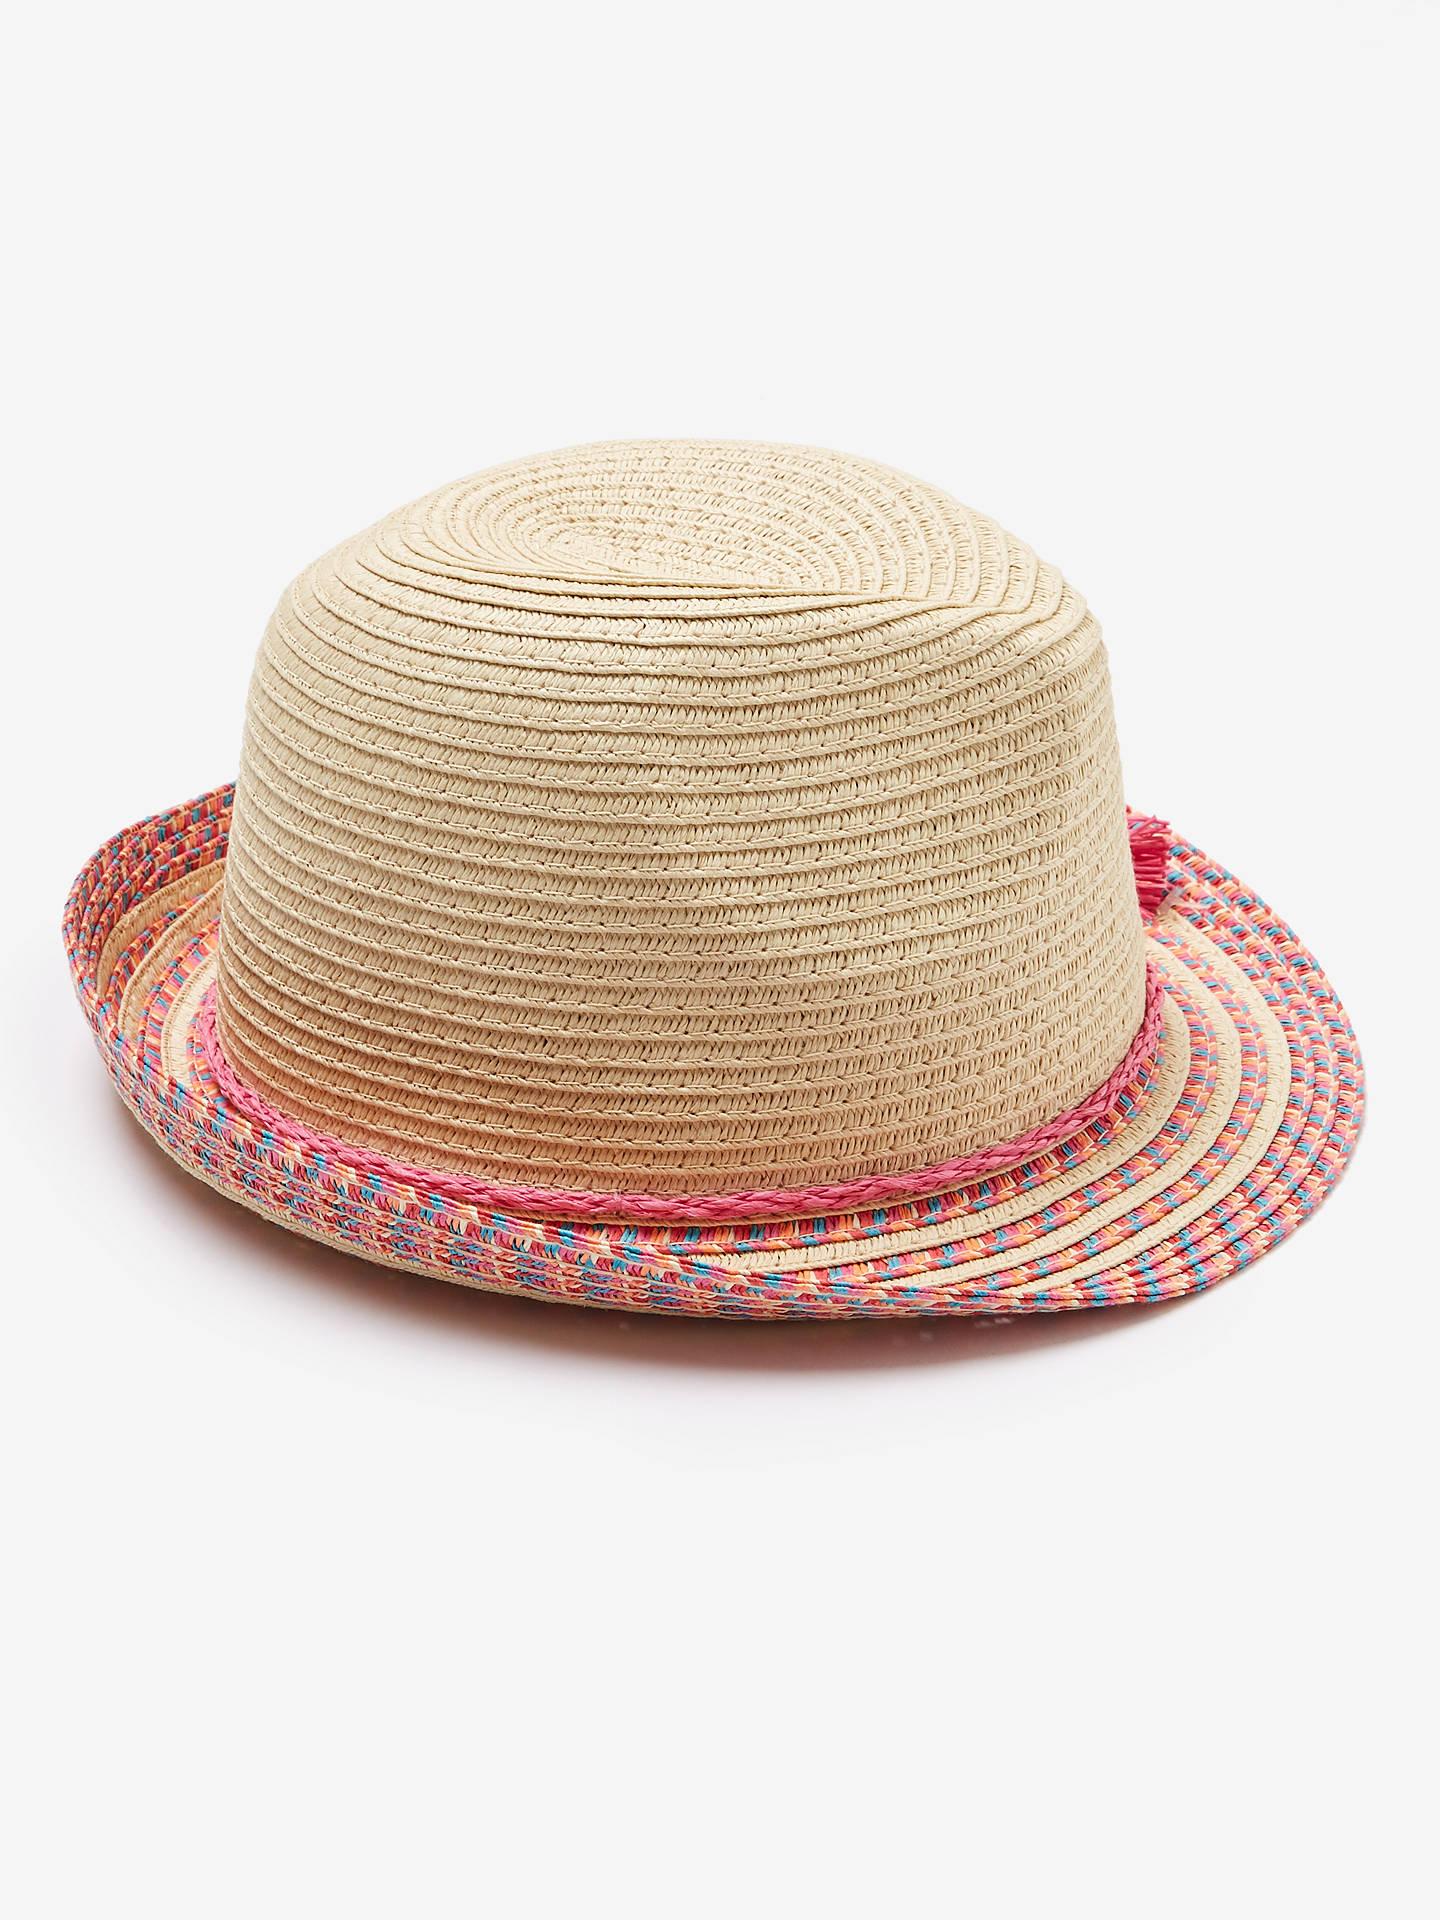 8e1a170ebb52f5 ... Buy John Lewis & Partners Children's Straw Trilby Woven Hat,  Neutral/Multi, 6